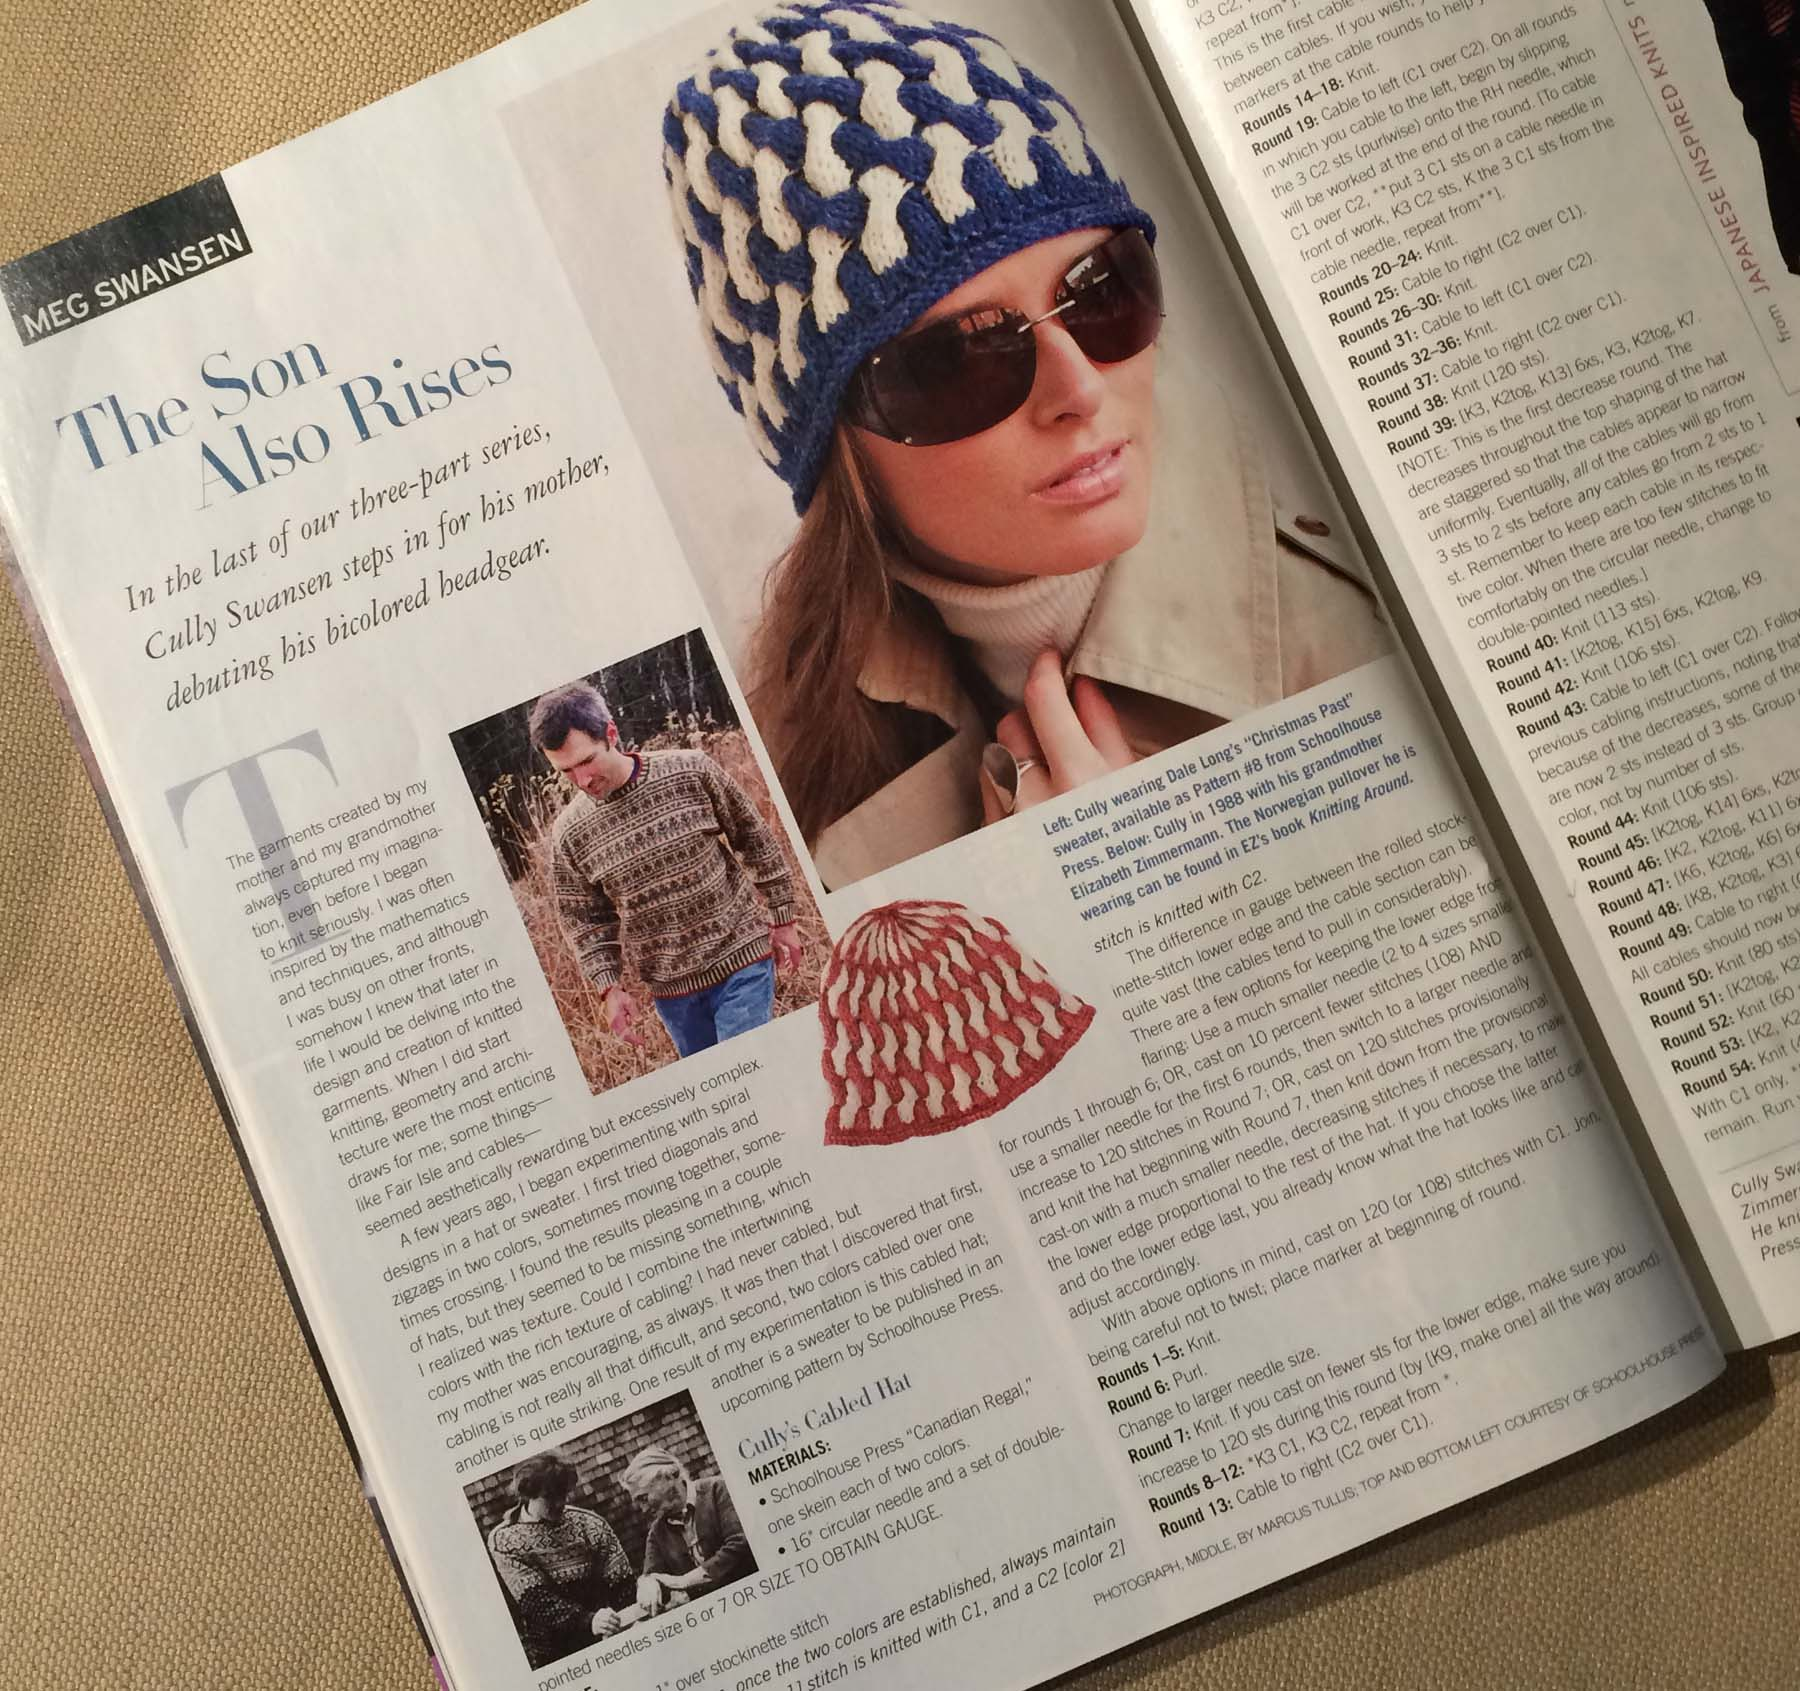 Cully Swansen's hat pattern